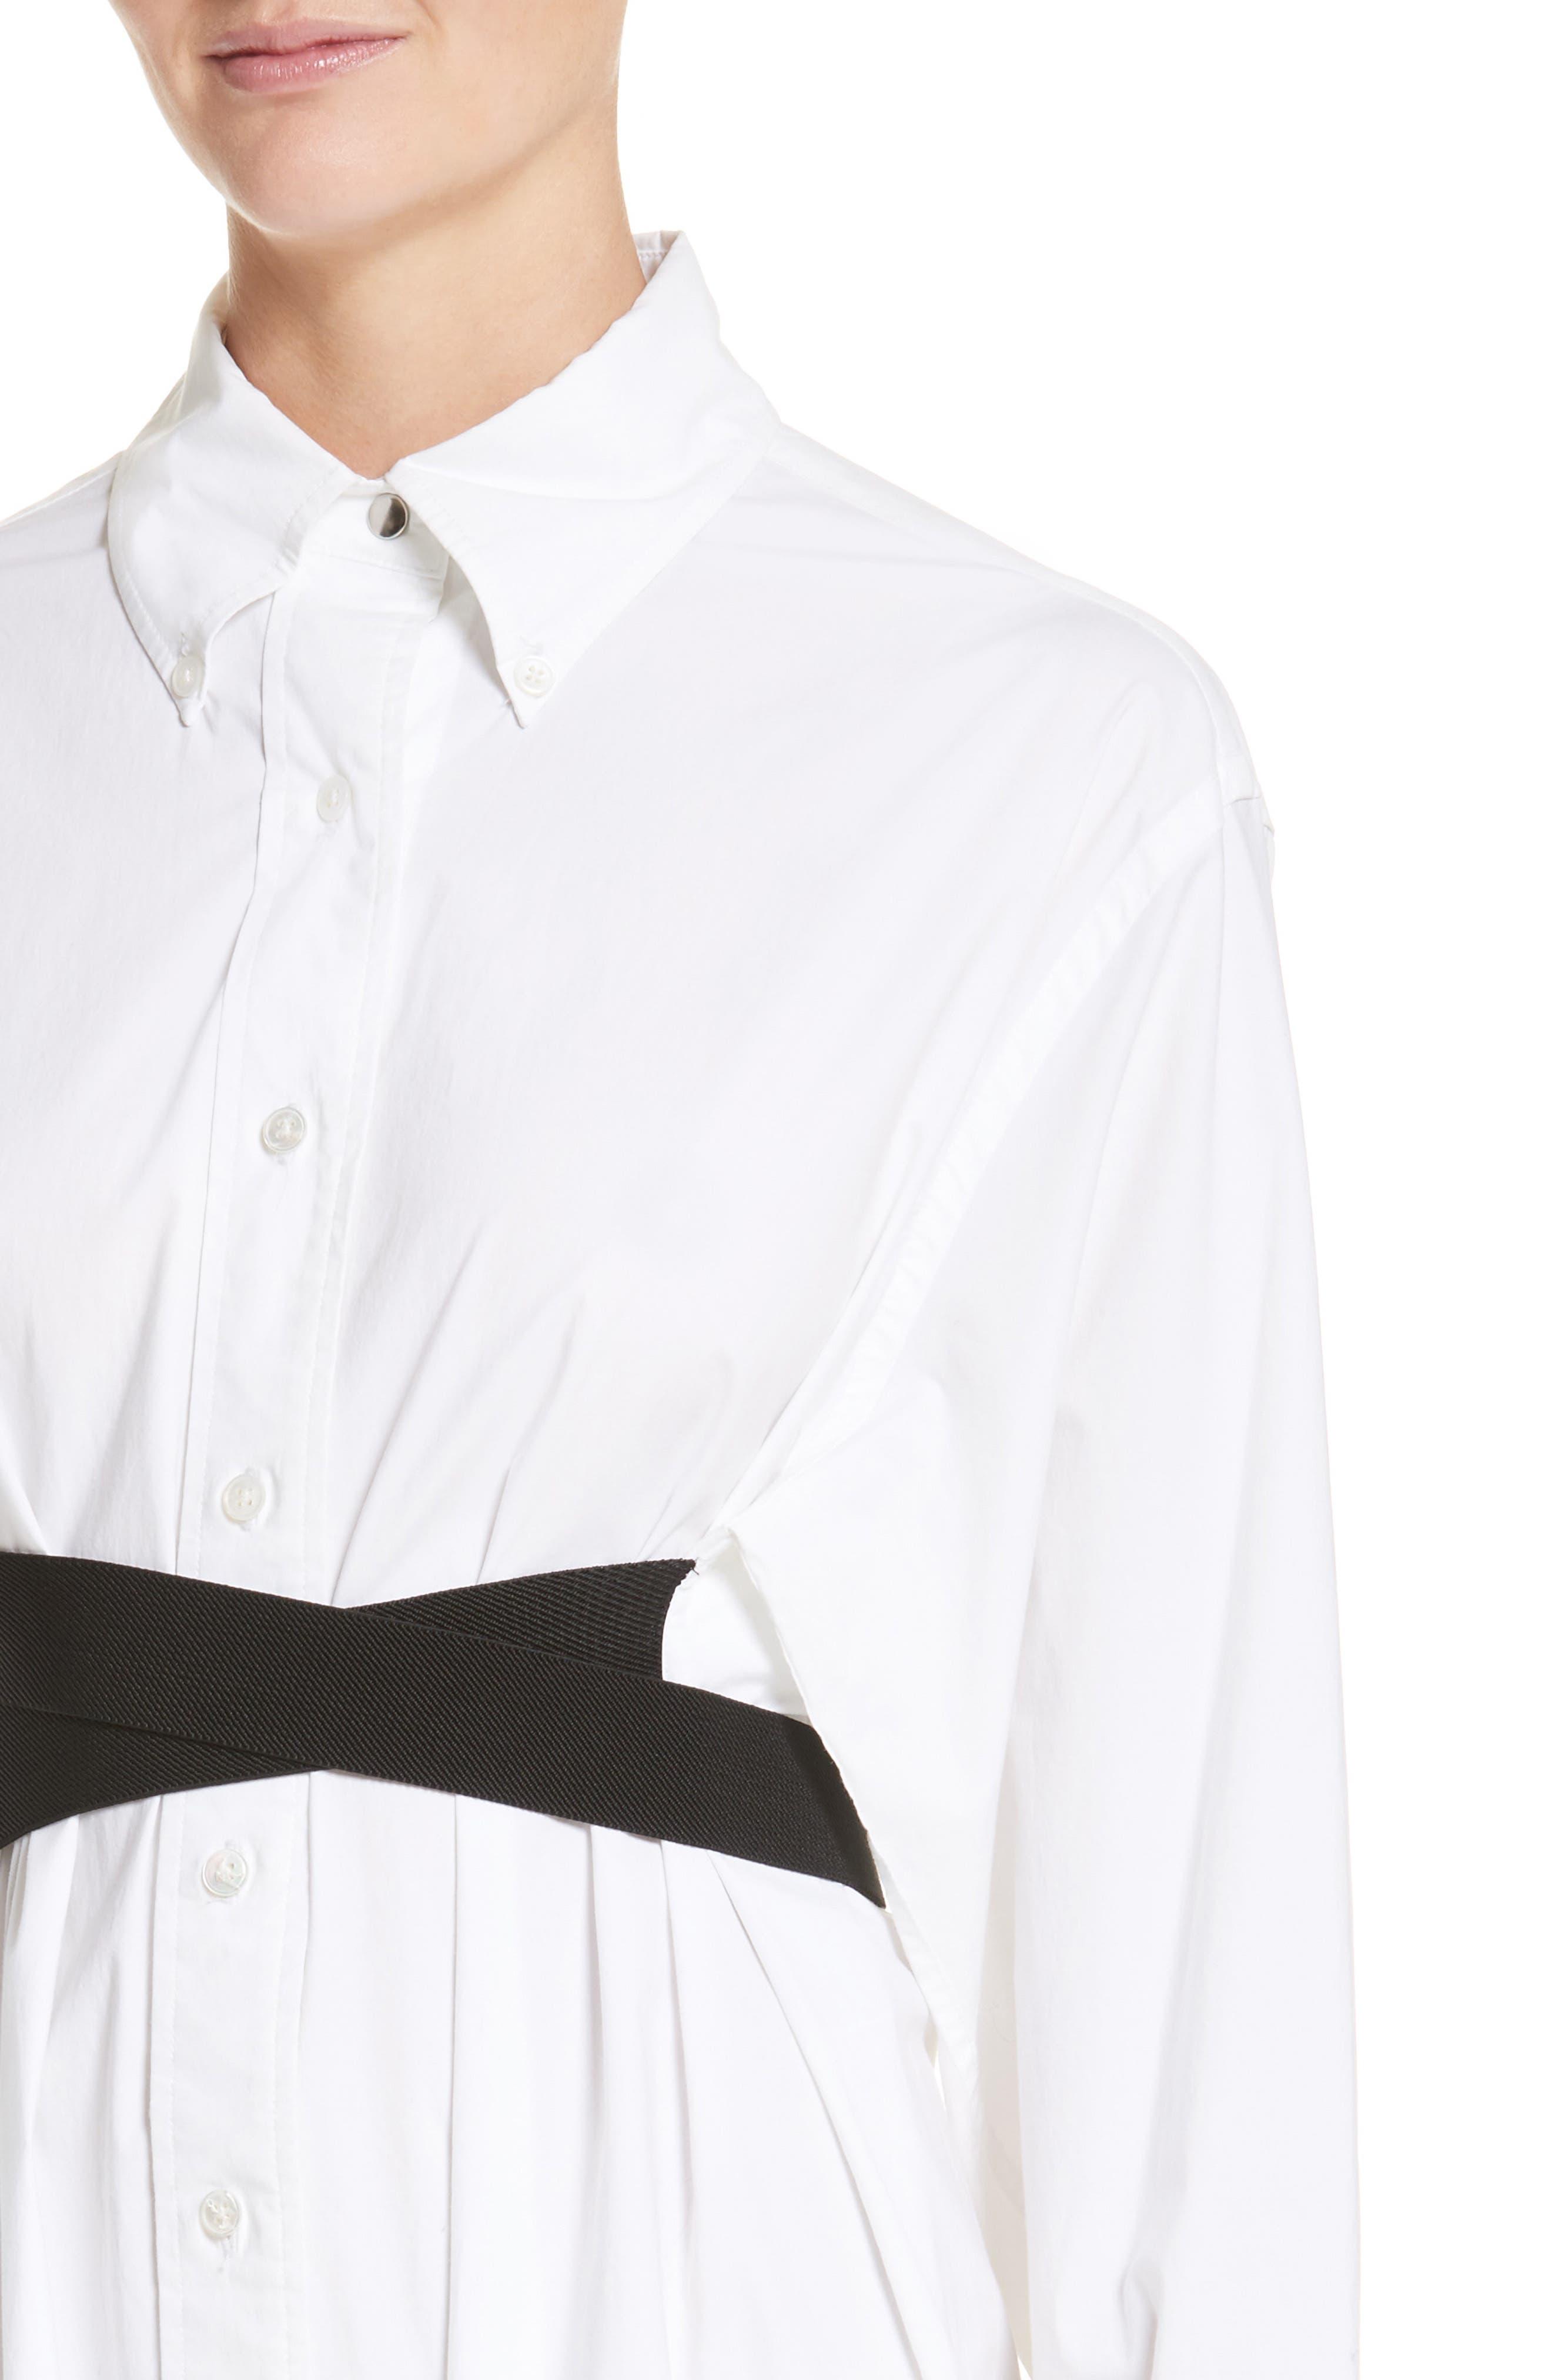 PSWL Belted Poplin Shirtdress,                             Alternate thumbnail 4, color,                             Optic White/ Black